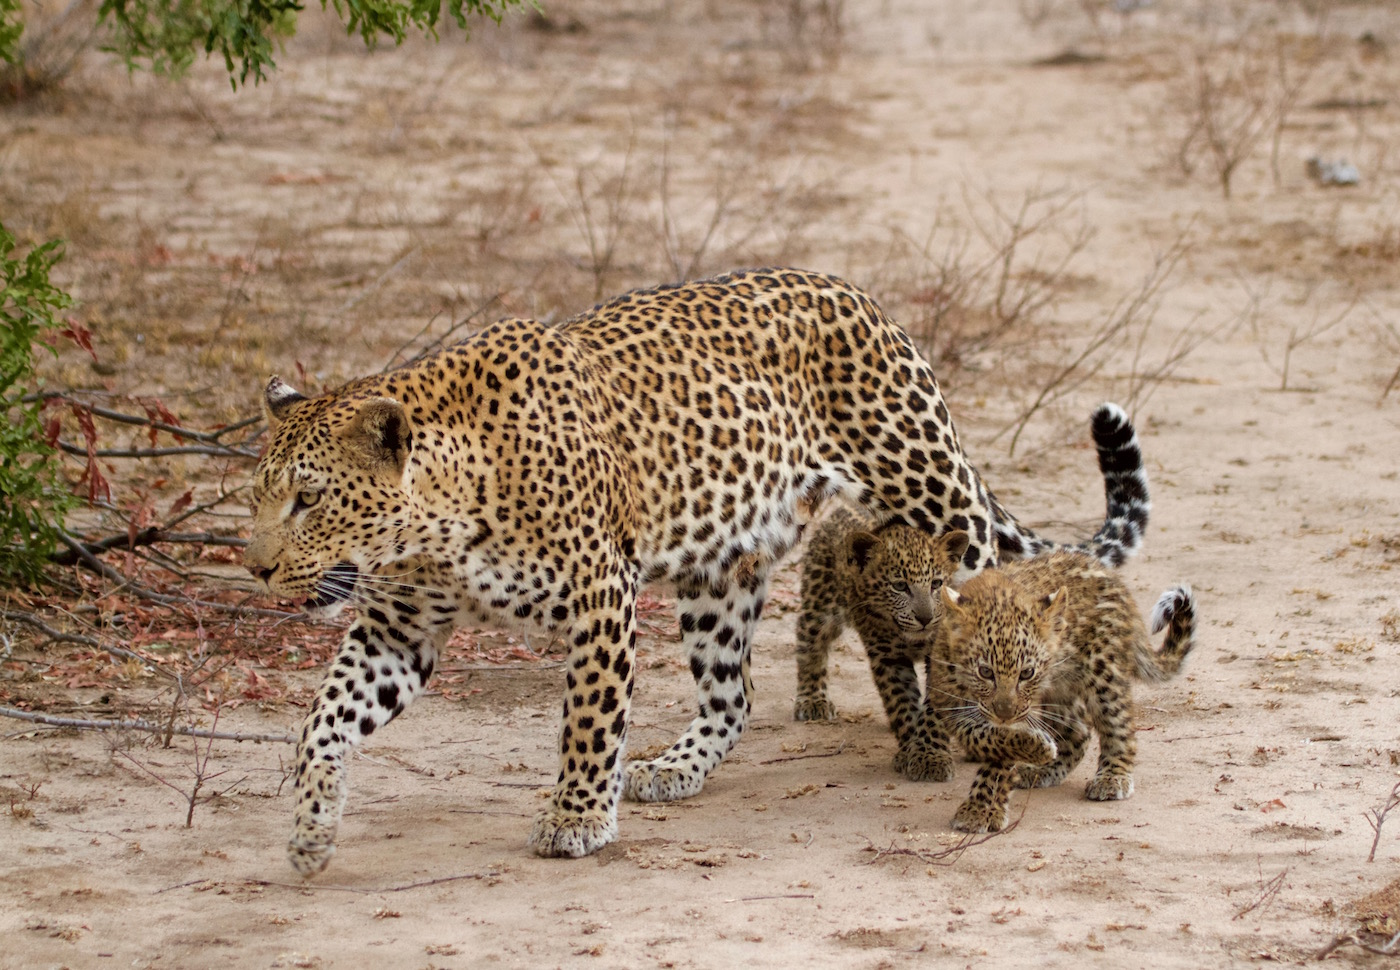 MAshaba cubs